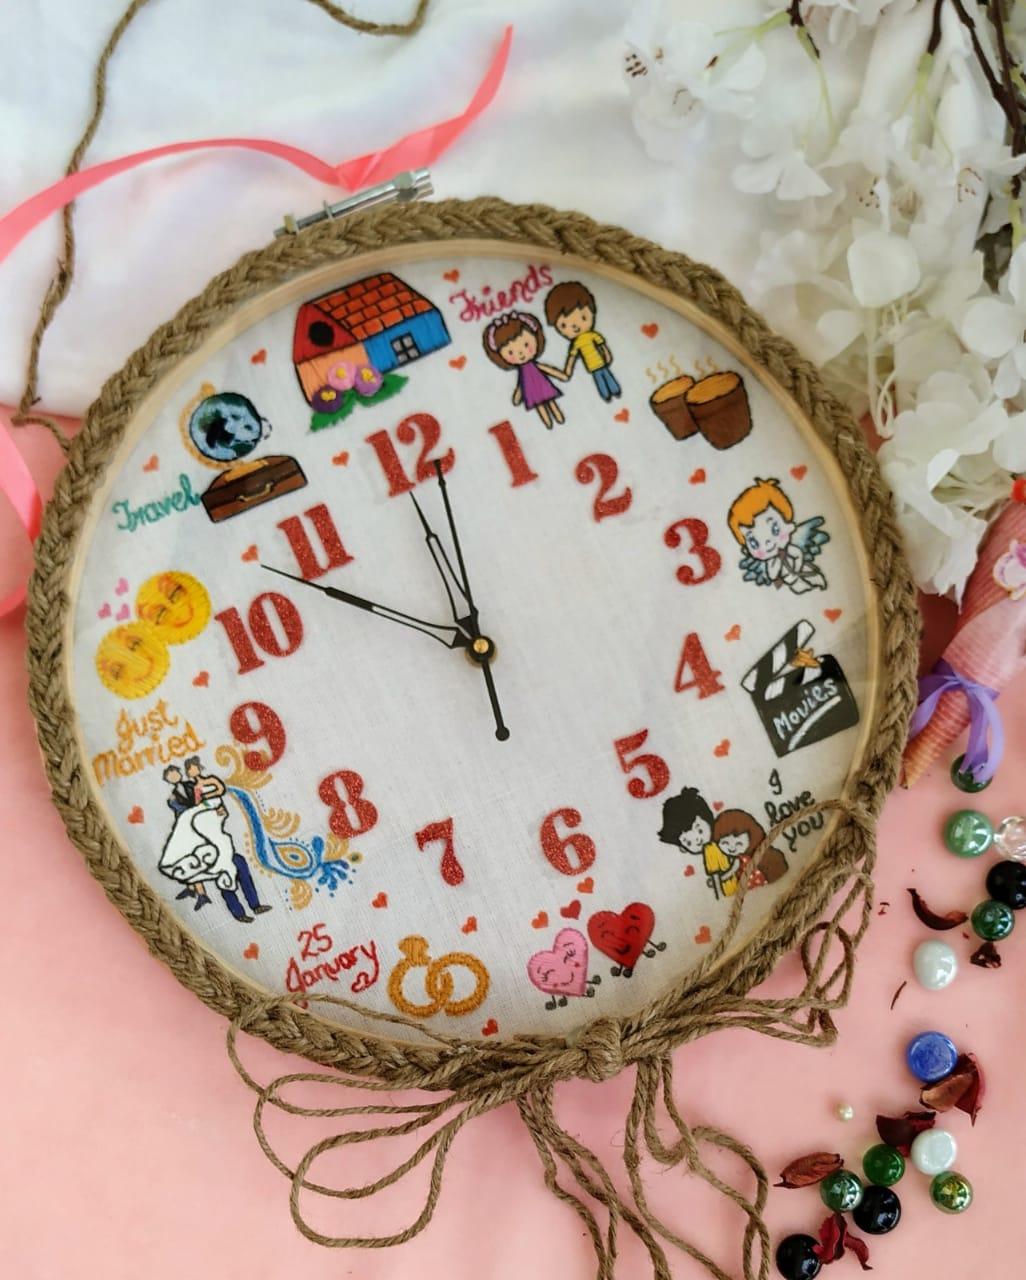 Hand Embroidered Theme Framed Clocks  Love Theme  Hand Embroidered Theme Framed Clocks  Love Theme2